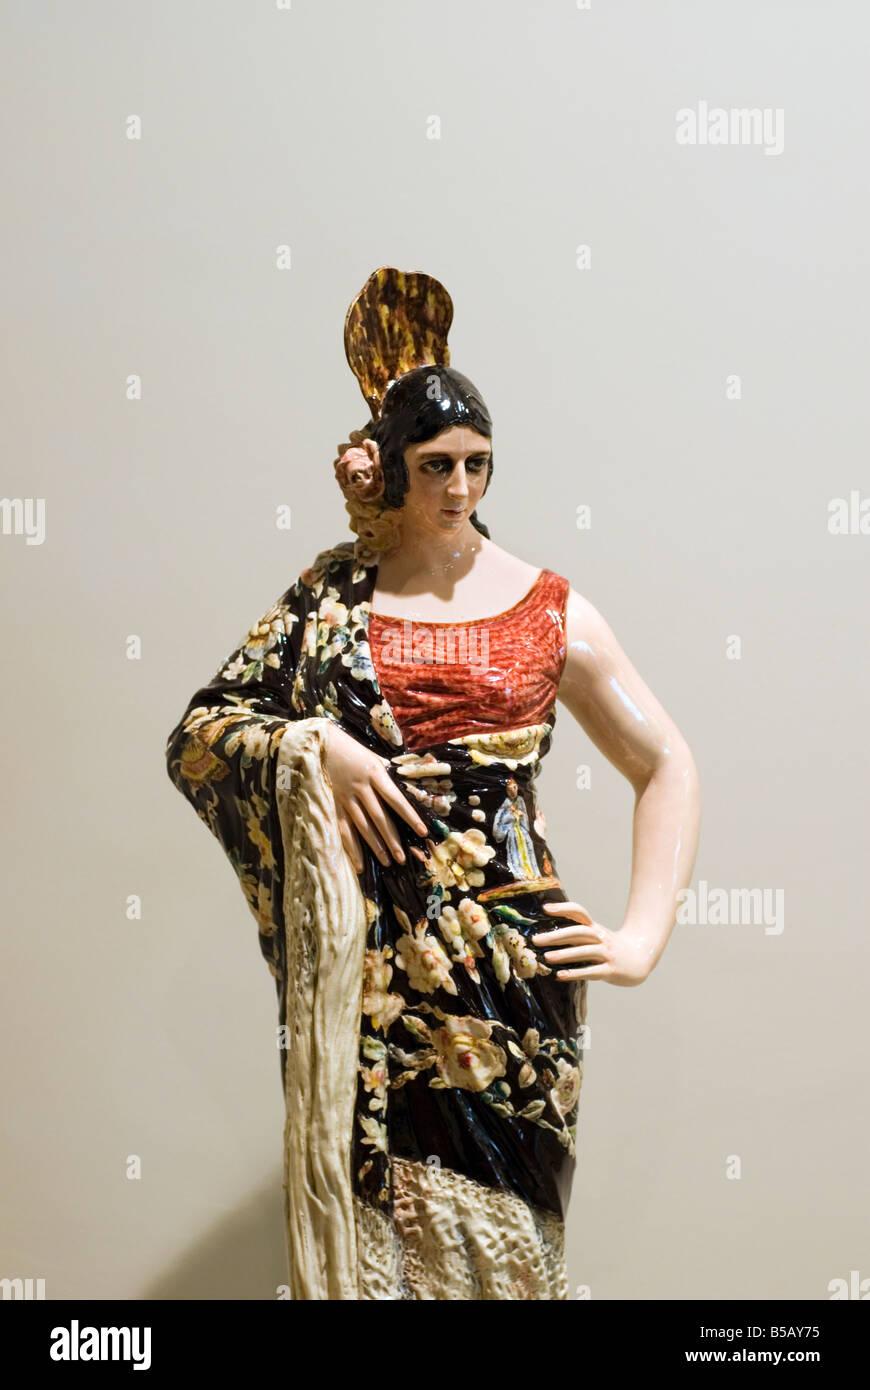 Ceramic figurine of traditionally dressed Spanish woman inside the Ceramics Museum Valencia Spain - Stock Image